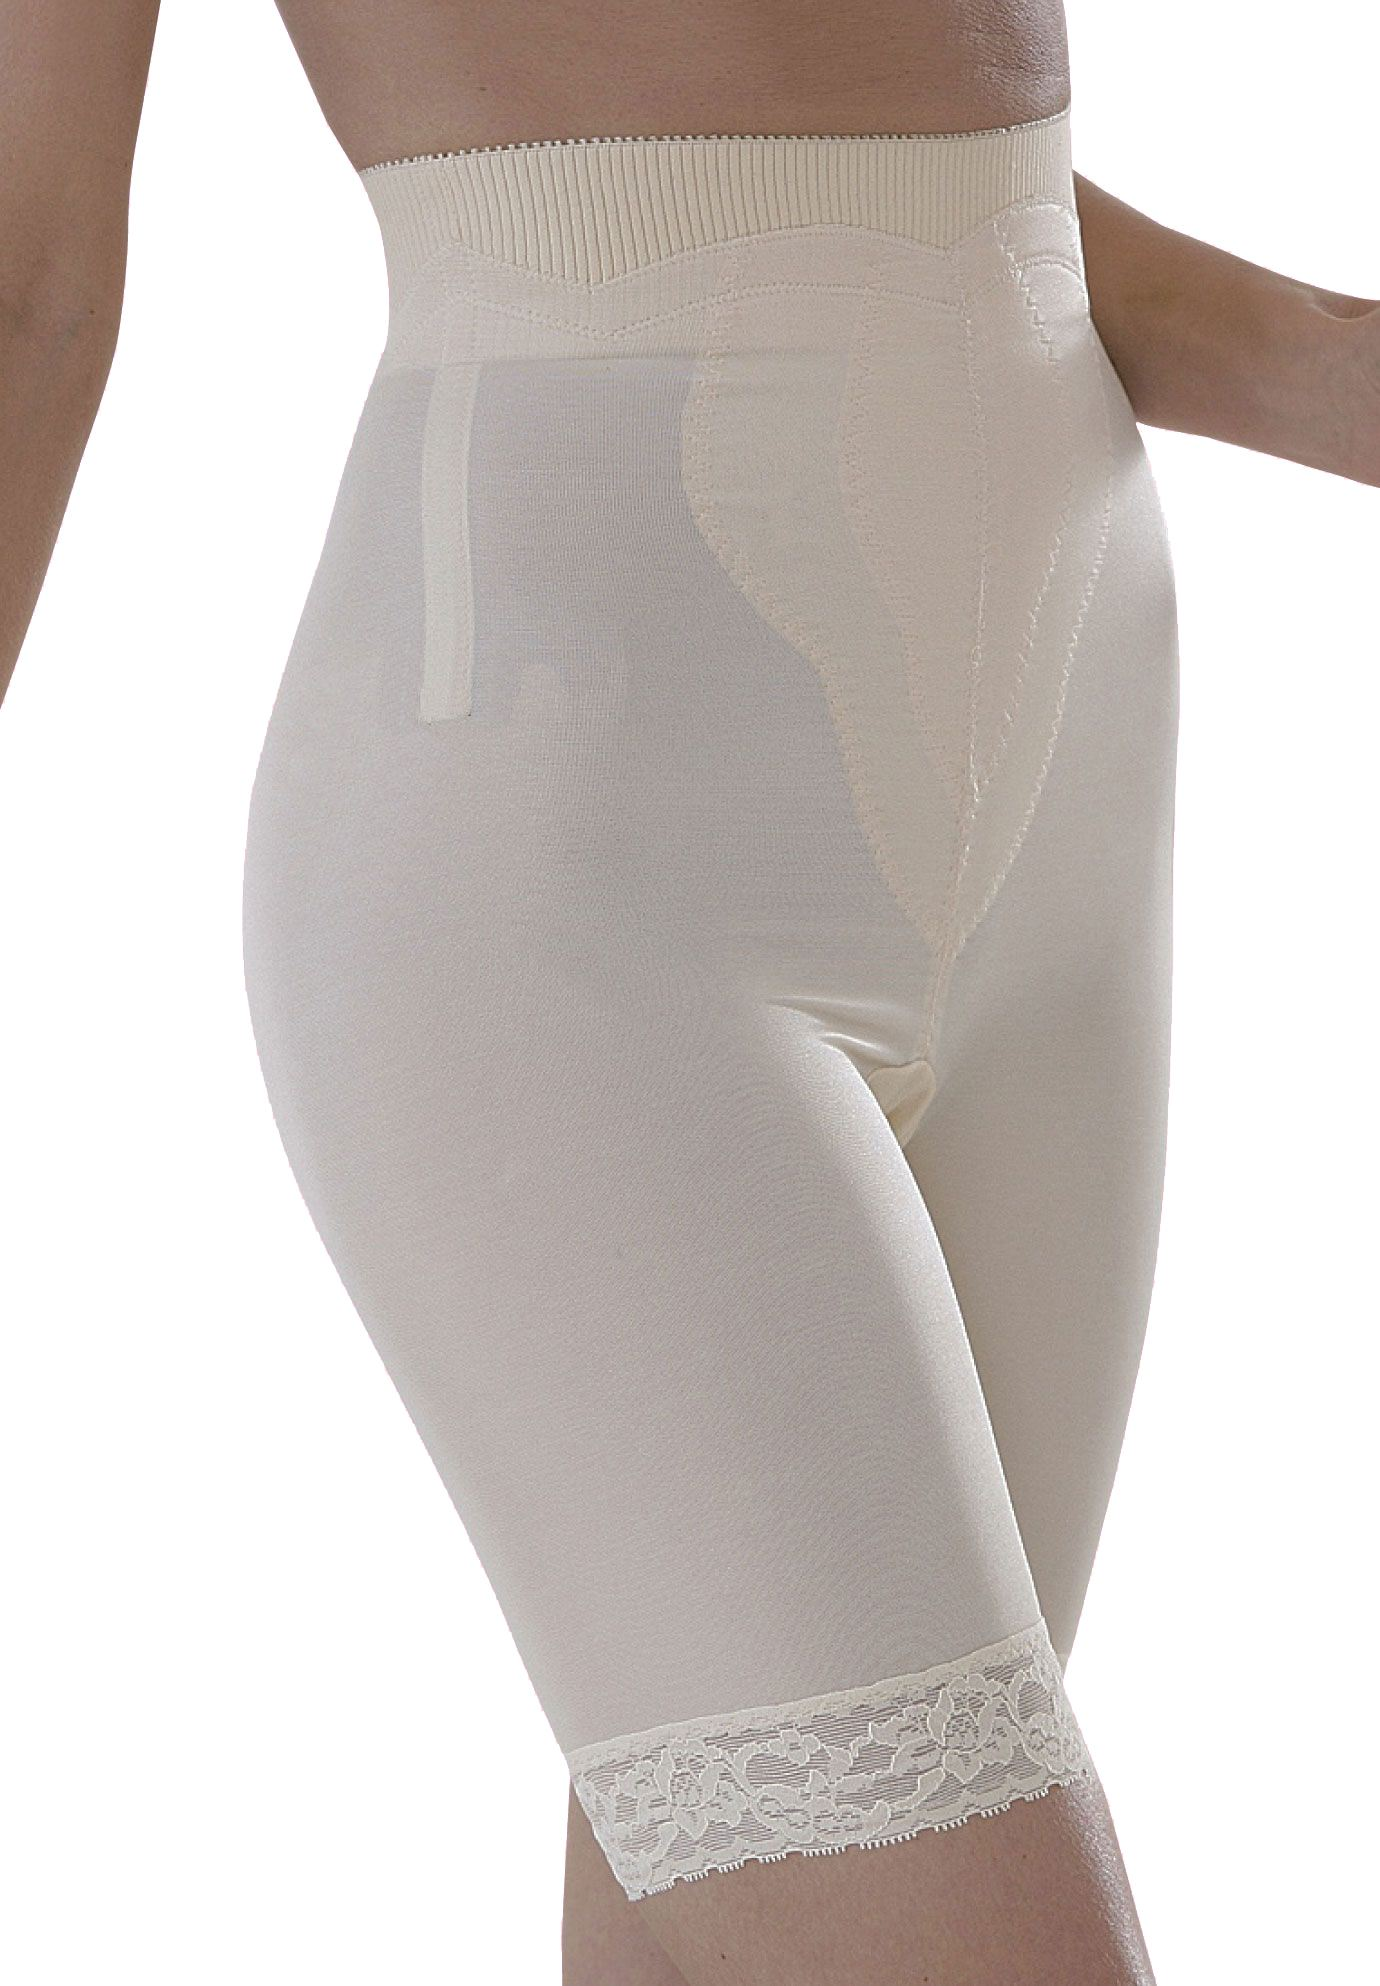 740ef85b53 Medium shaping long-leg shaper by Rago - Women s Plus Size Clothing ...